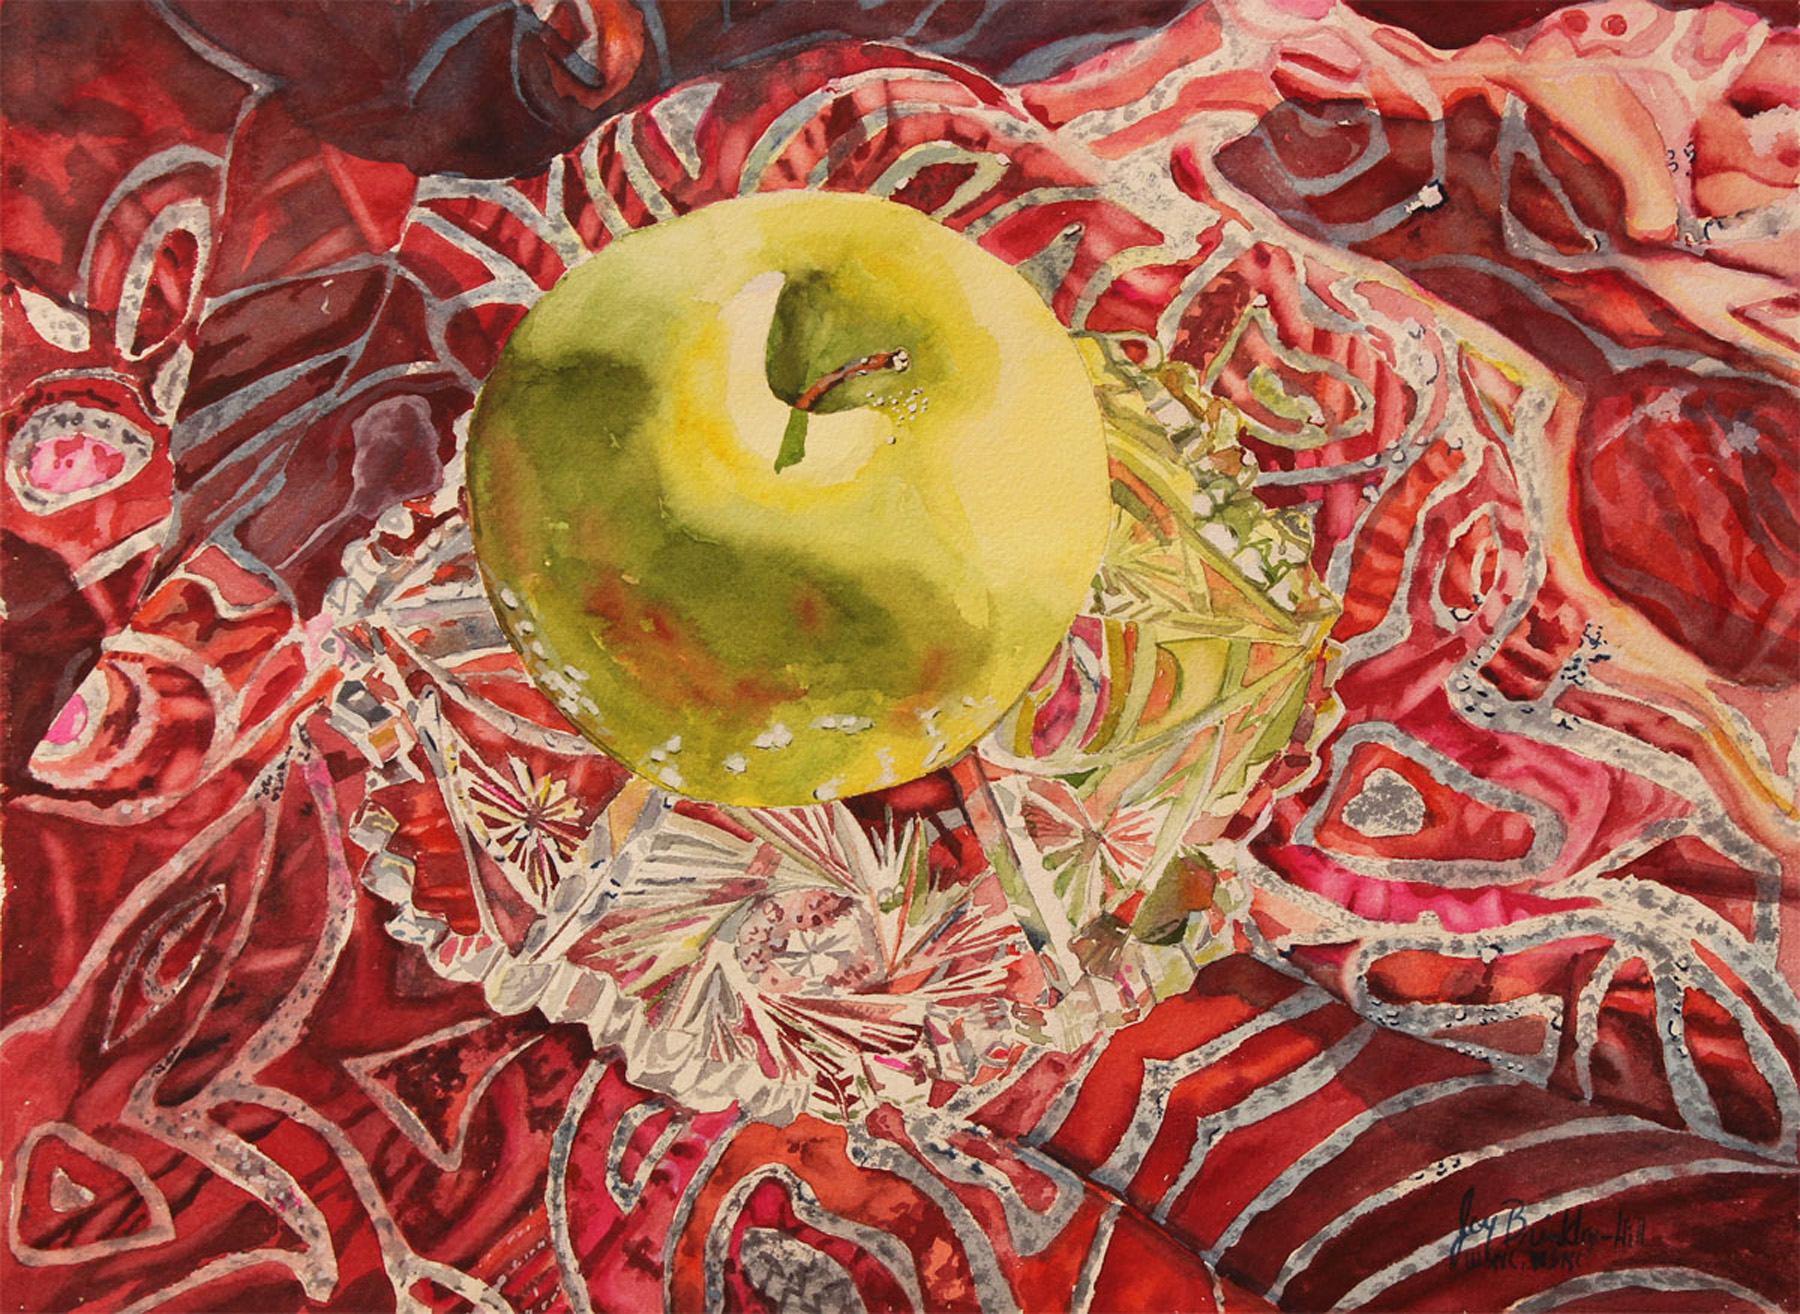 Joy Brinkley-Hill: Picky Eaters